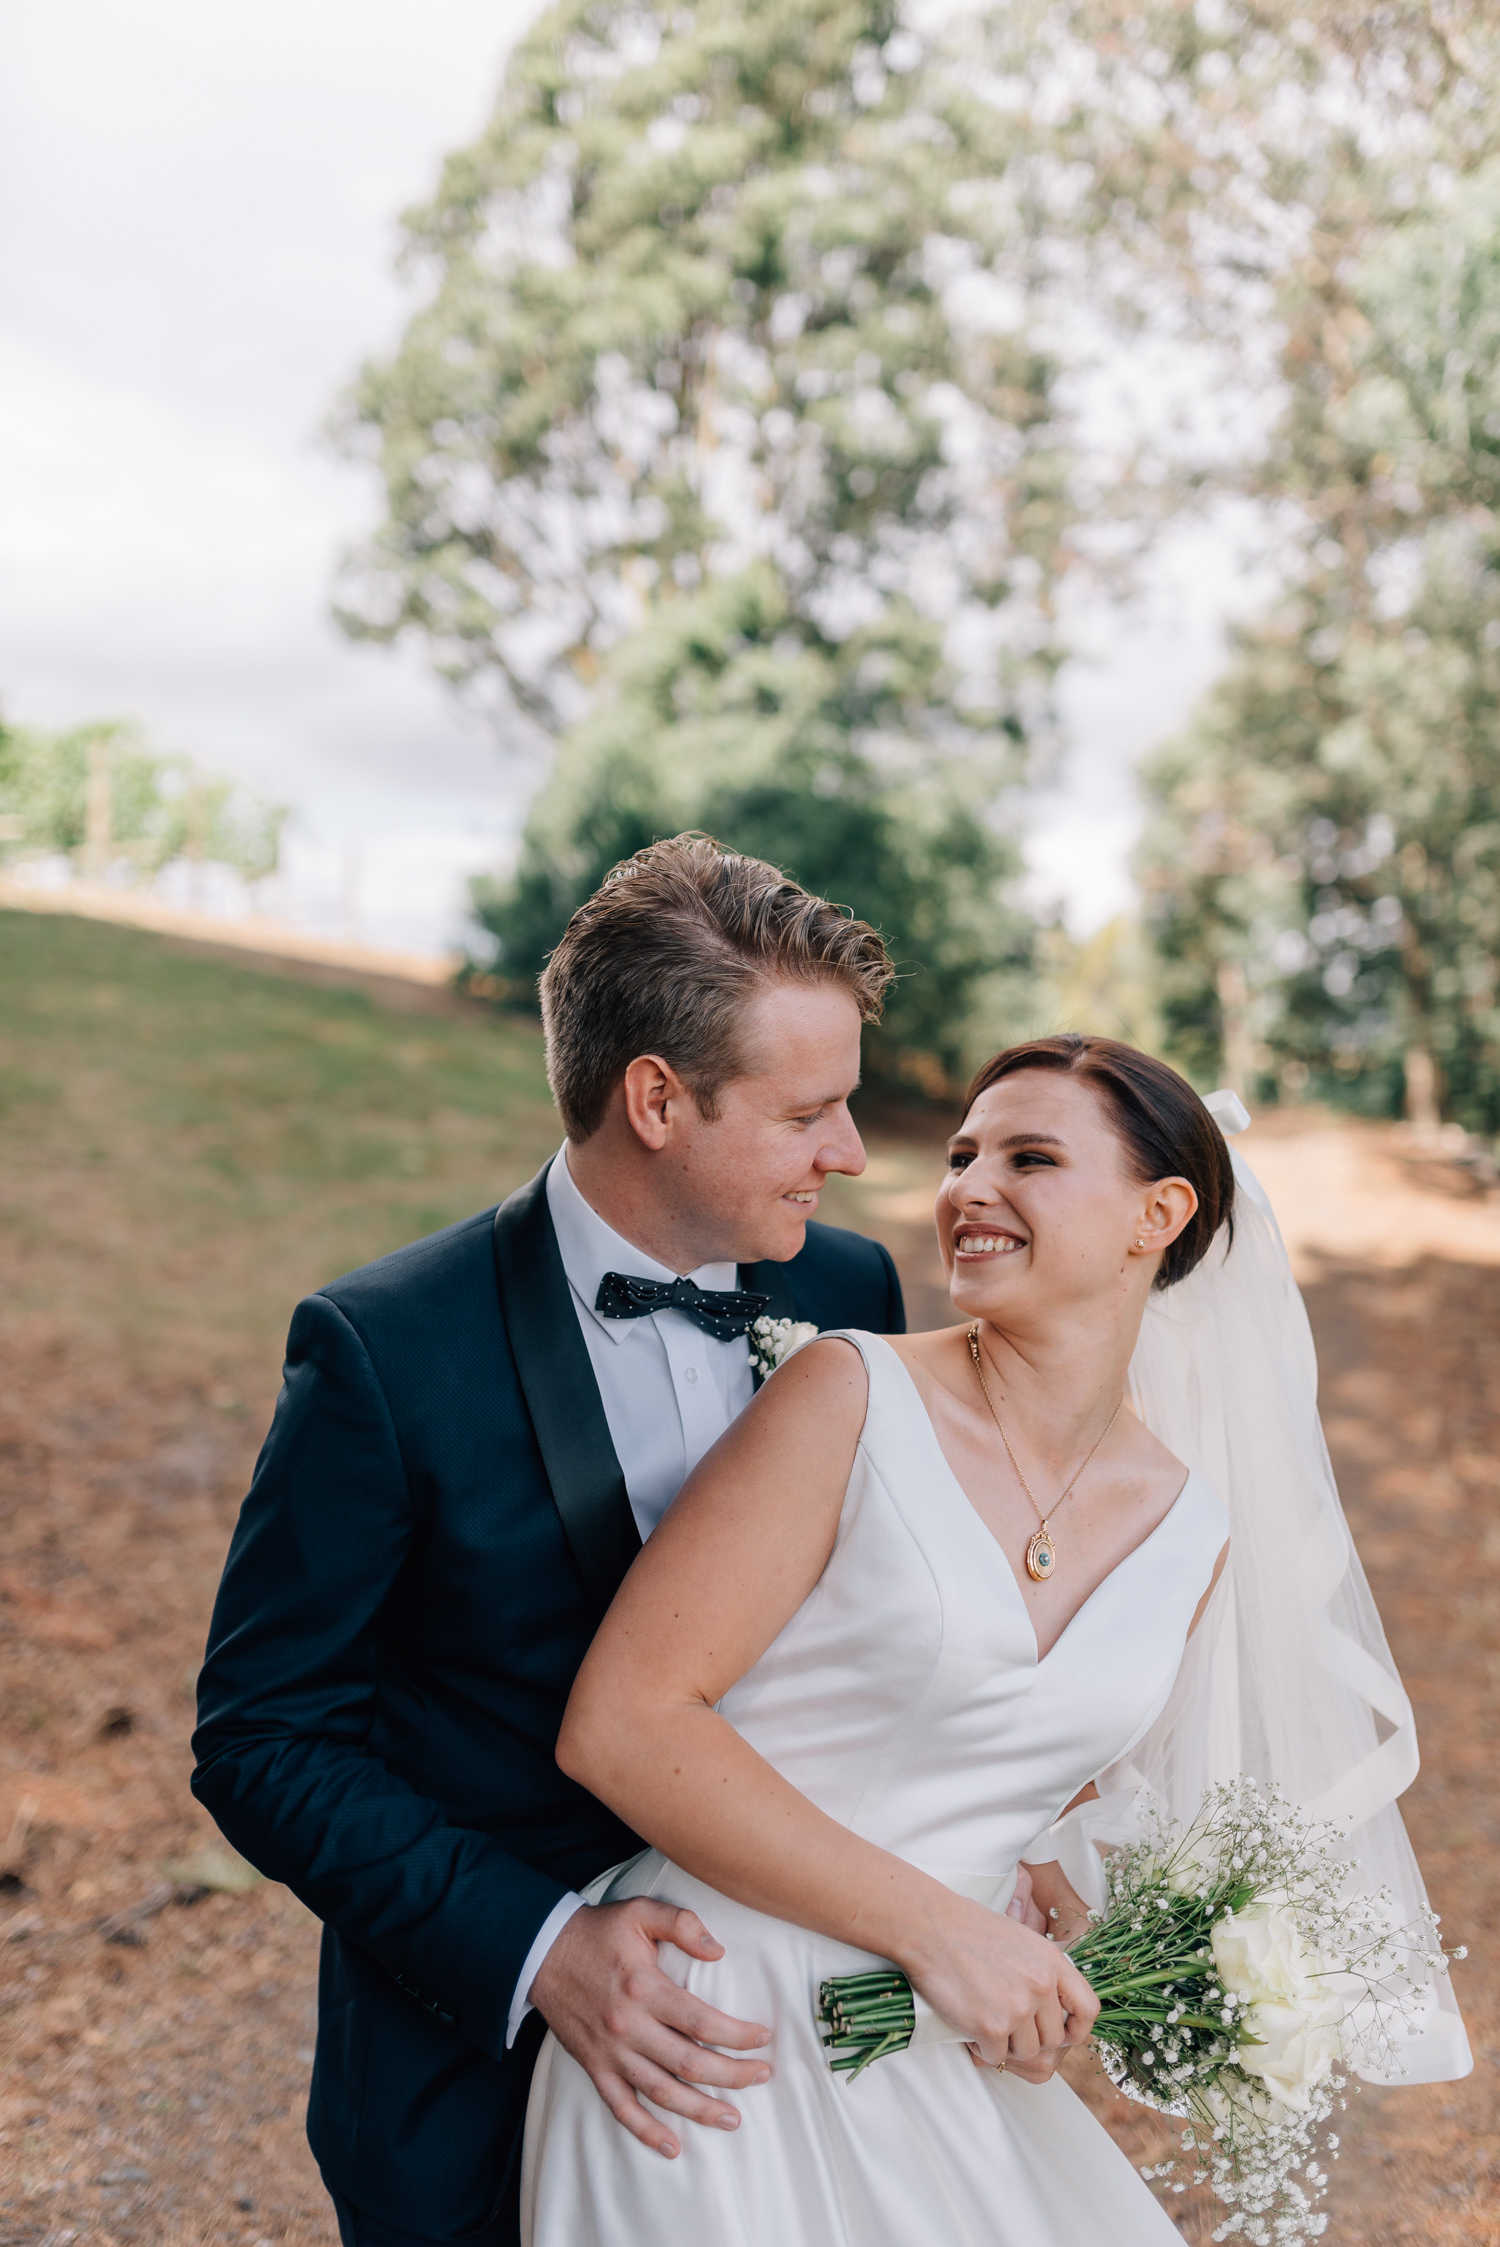 Josef-Chromy-Wedding-Photographer-52.jpg